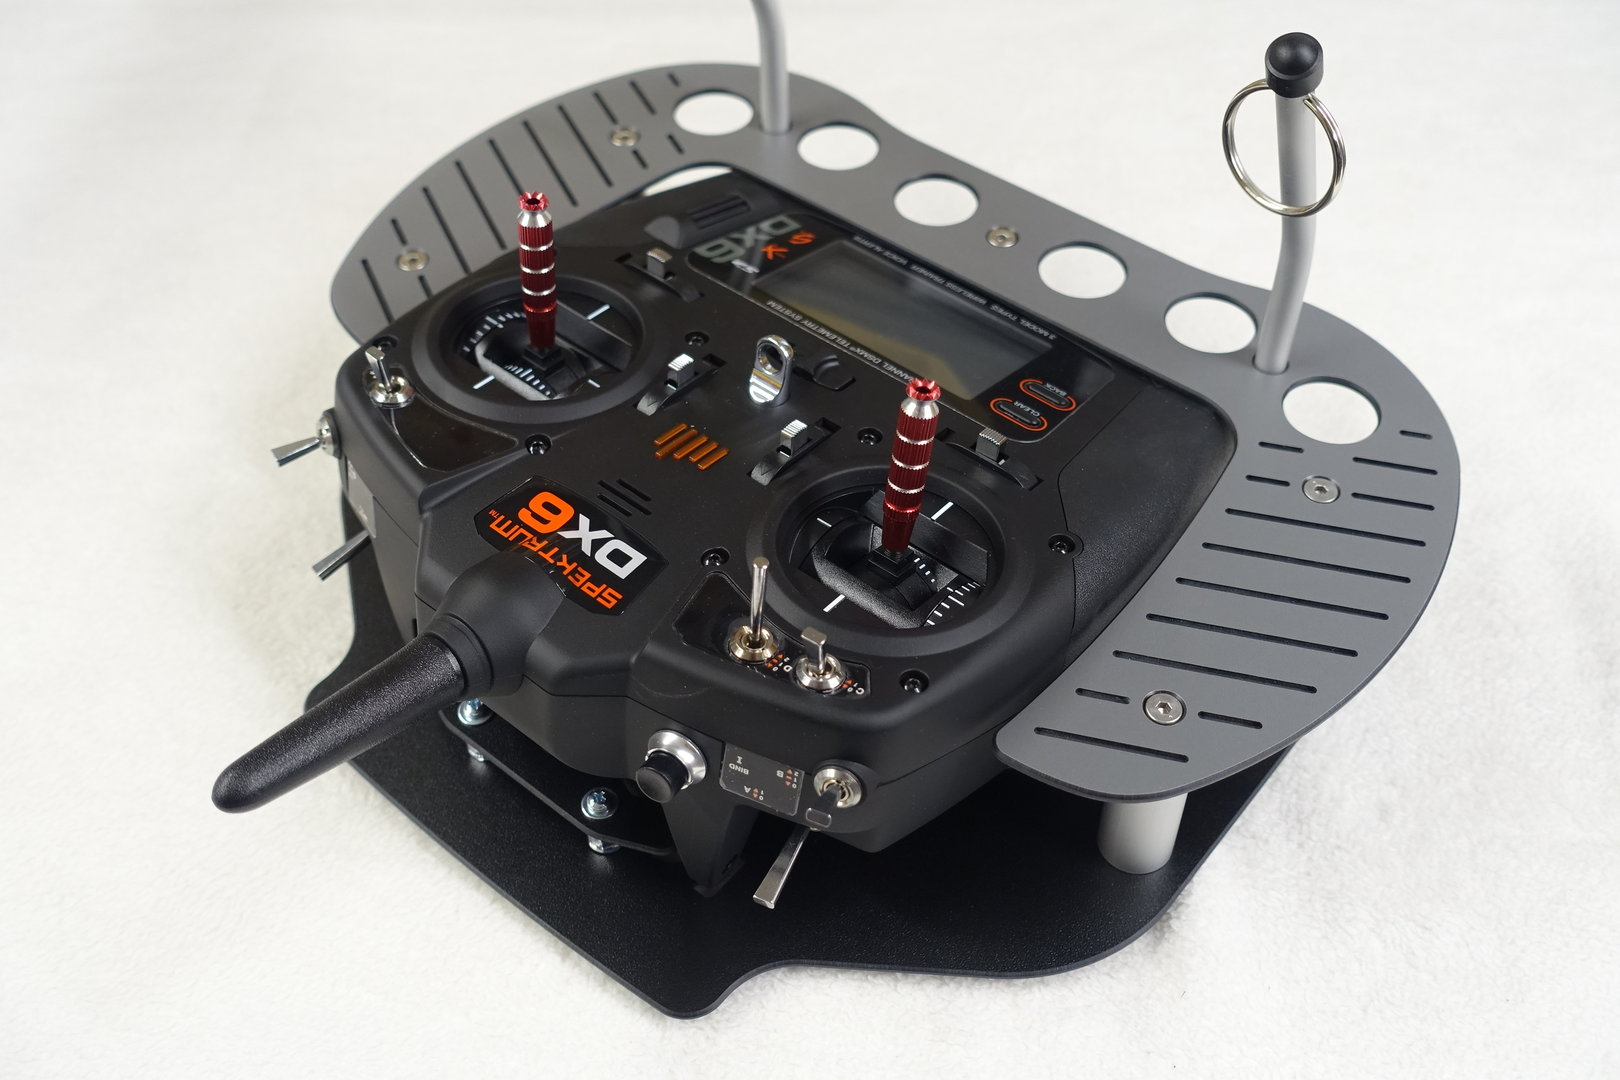 RC Modell Technik Pupitre DarkONE Spktrum DX6//DX7 V2 et DX8 G2